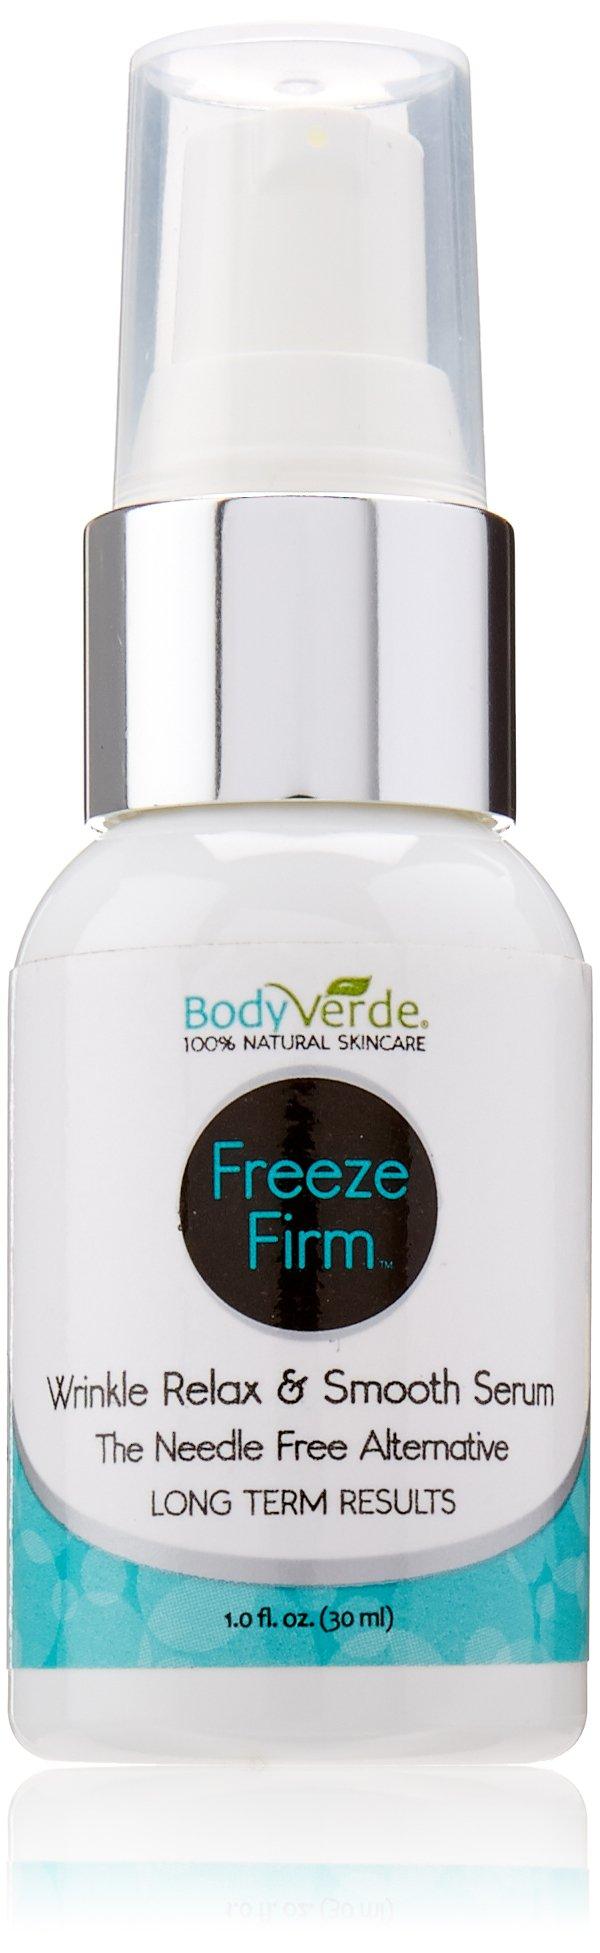 BodyVerde Freeze Firm, 1 Ounce